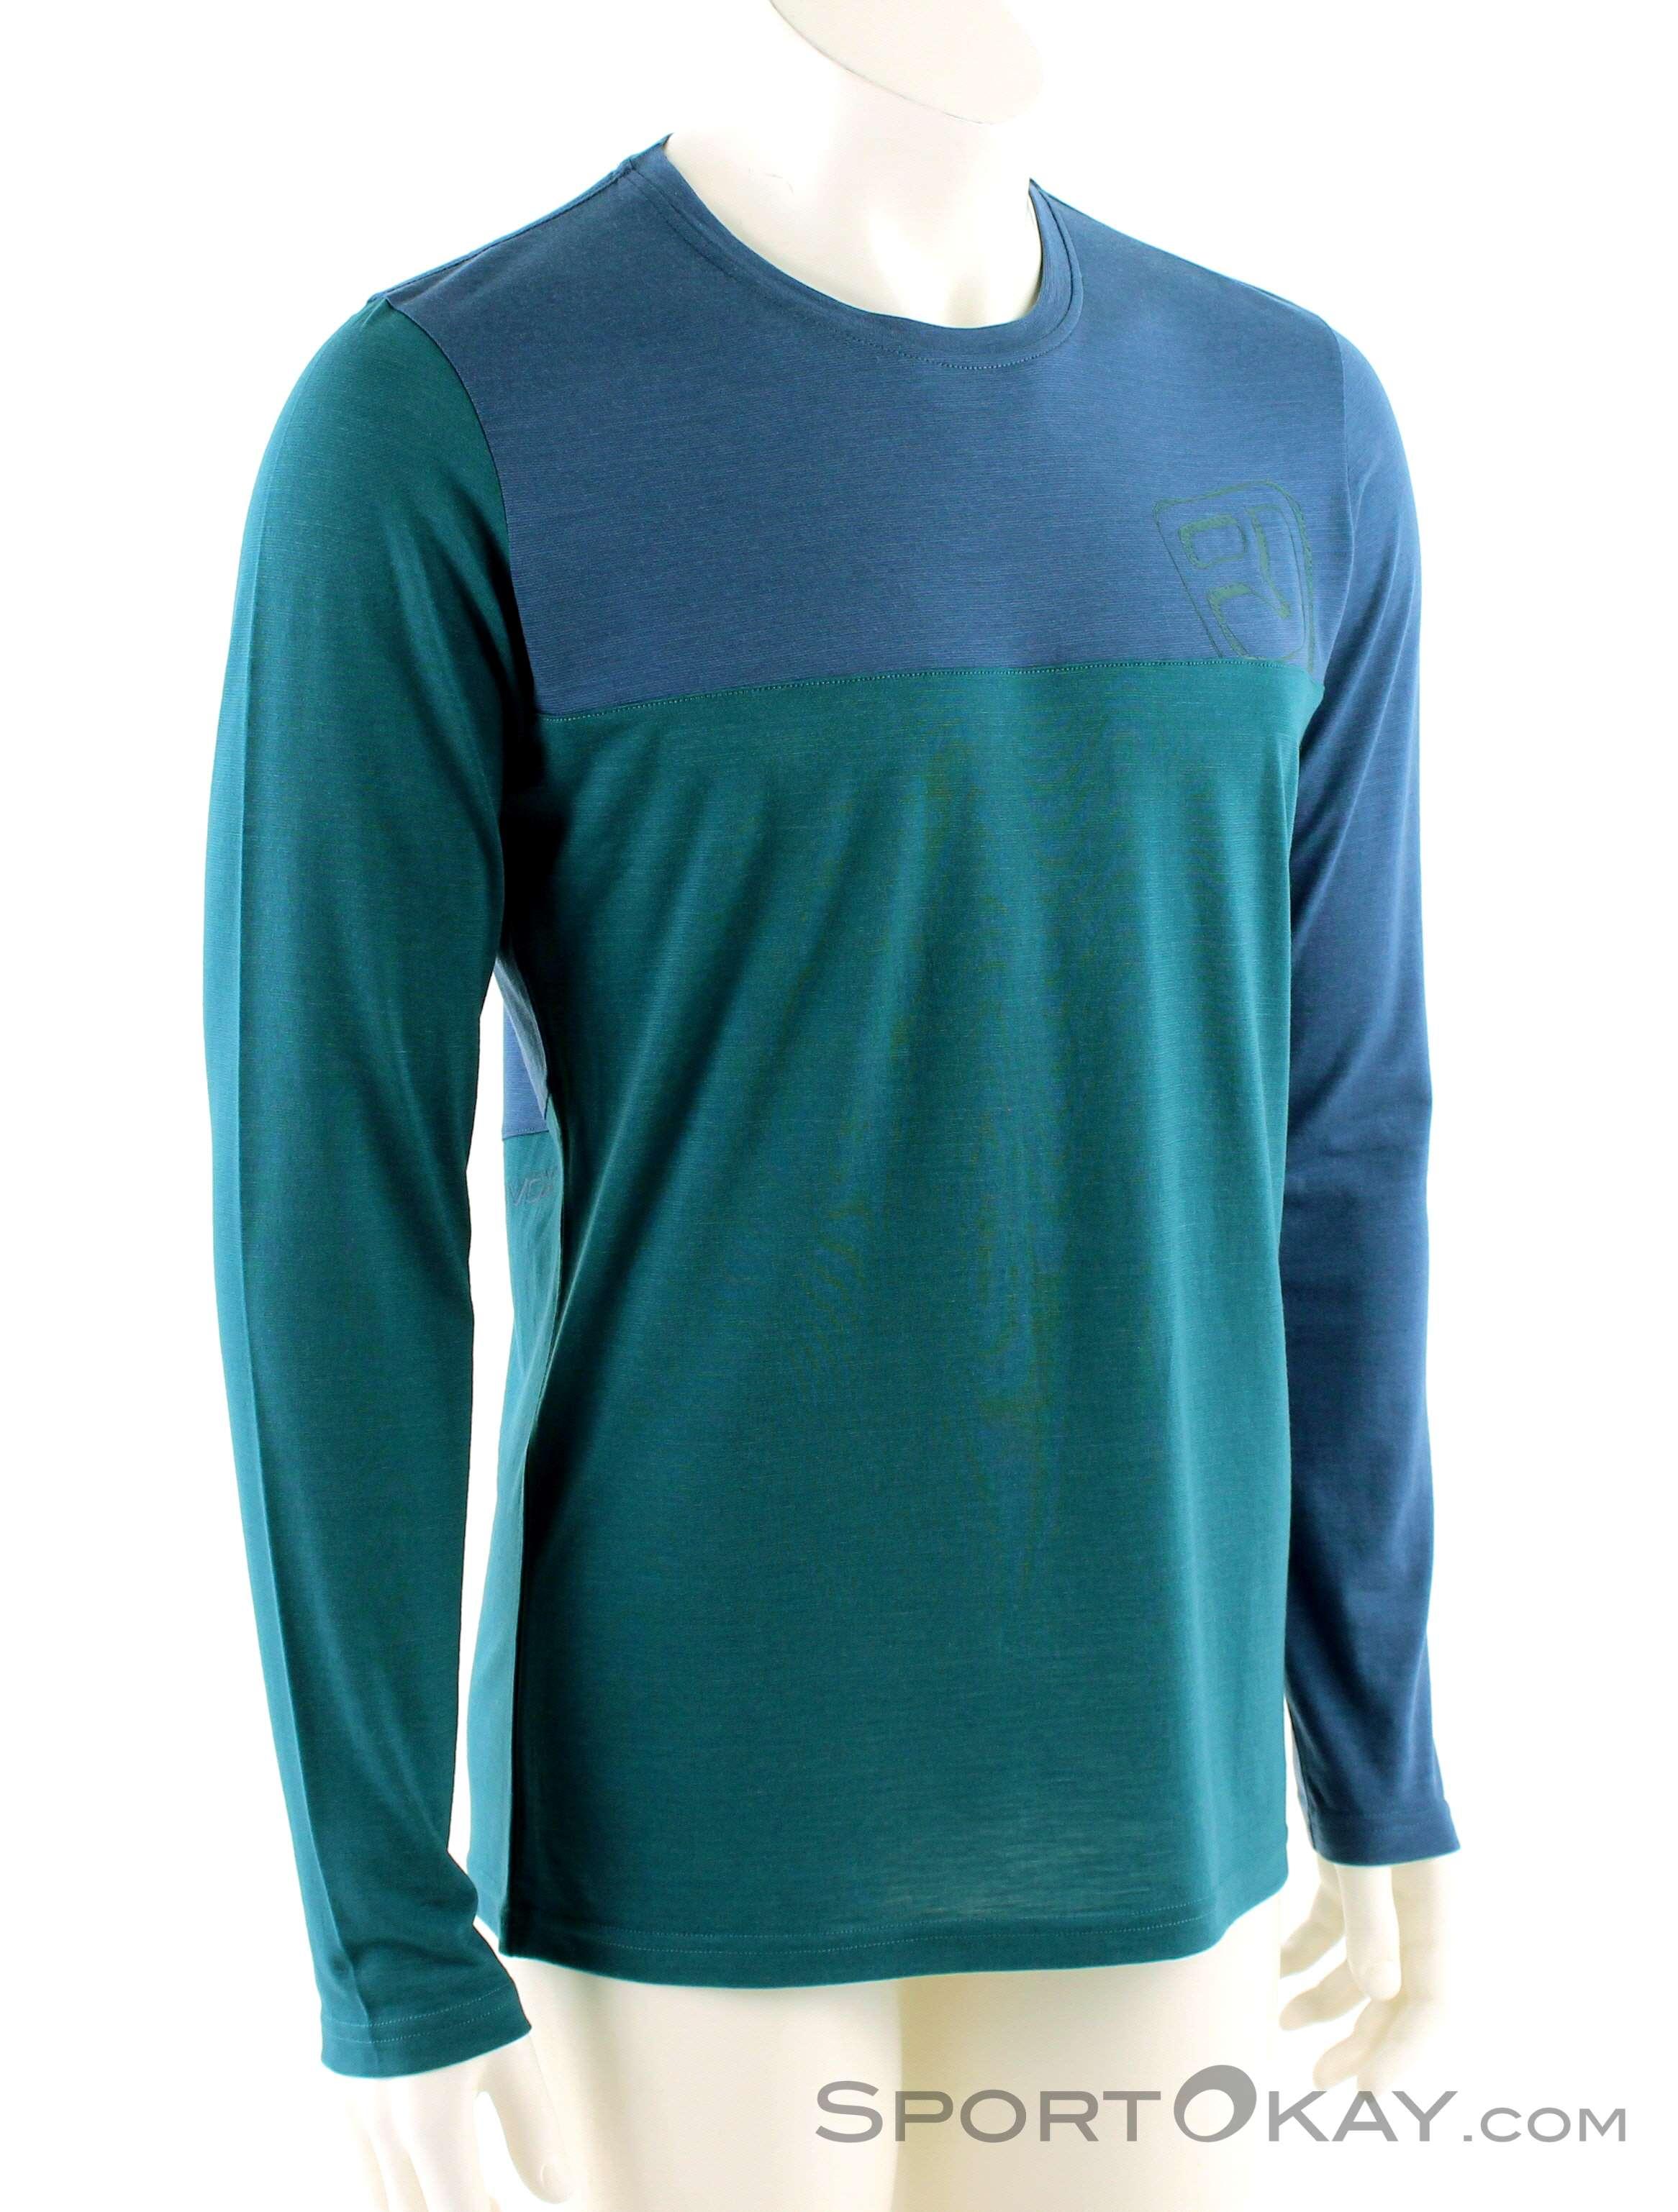 Ortovox 150 Cool Logo Long Sleeve Herren Shirt-Blau-S